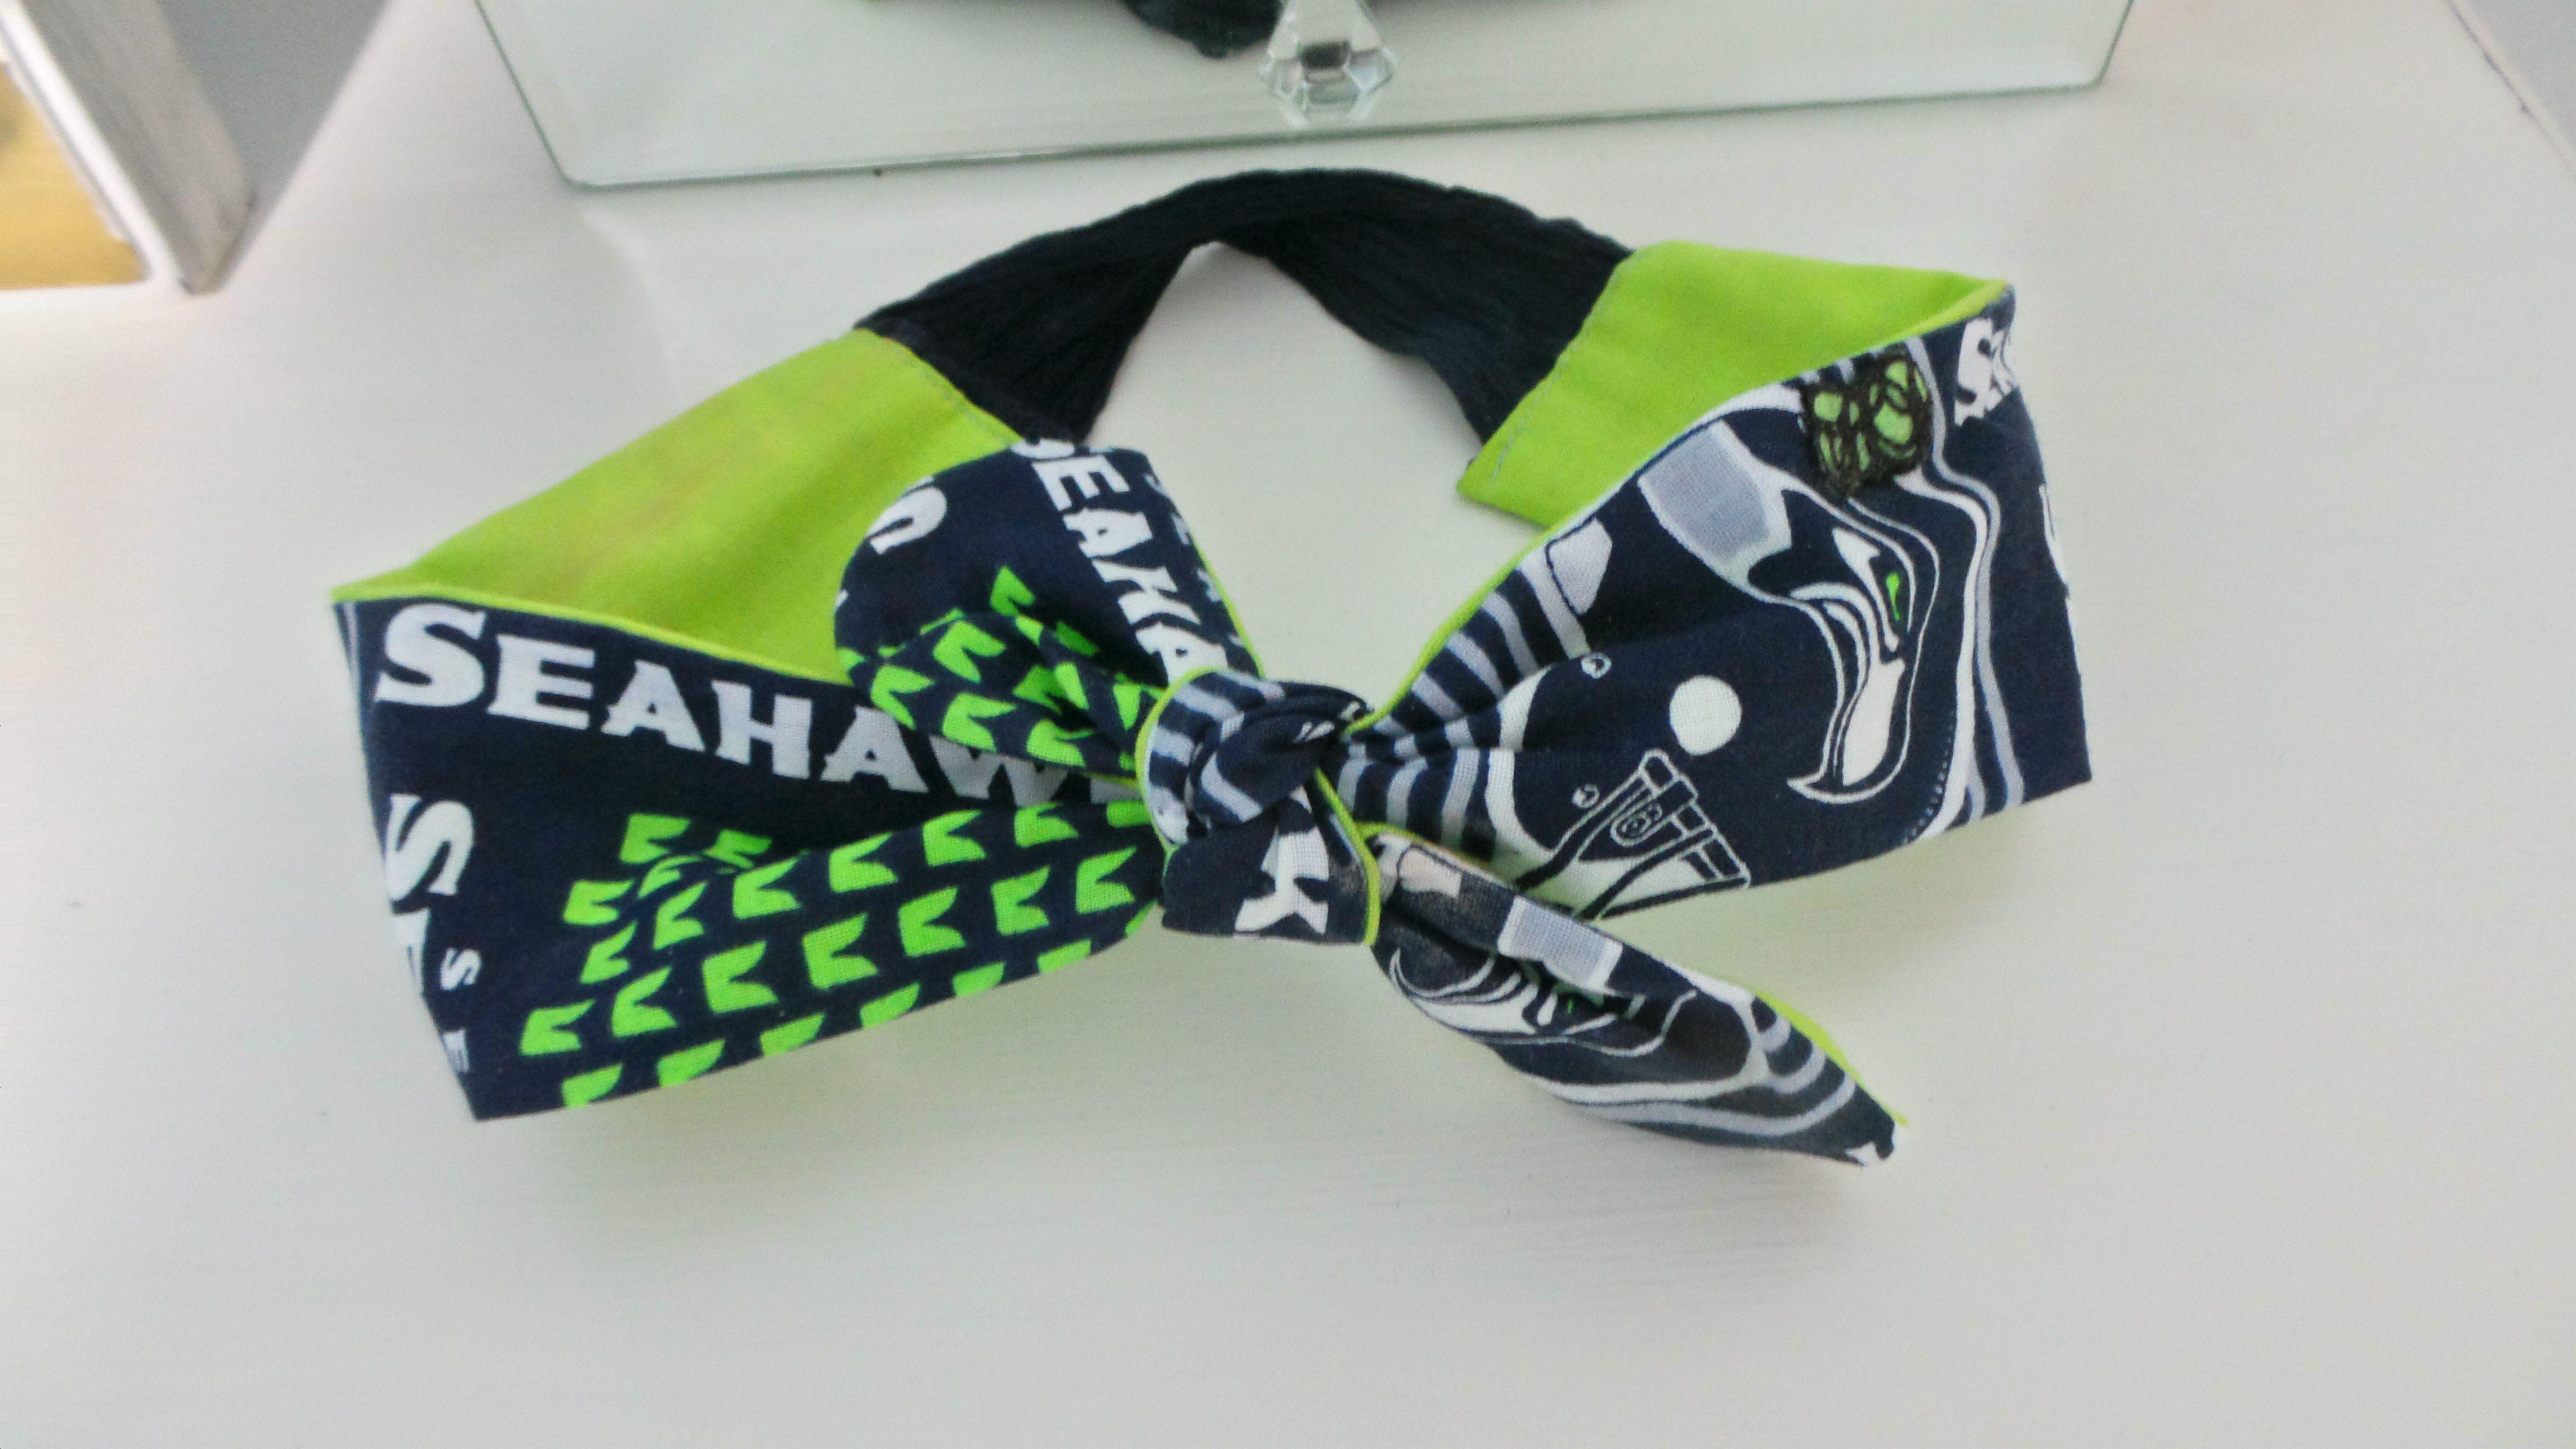 Seahawks_Motley_Headband